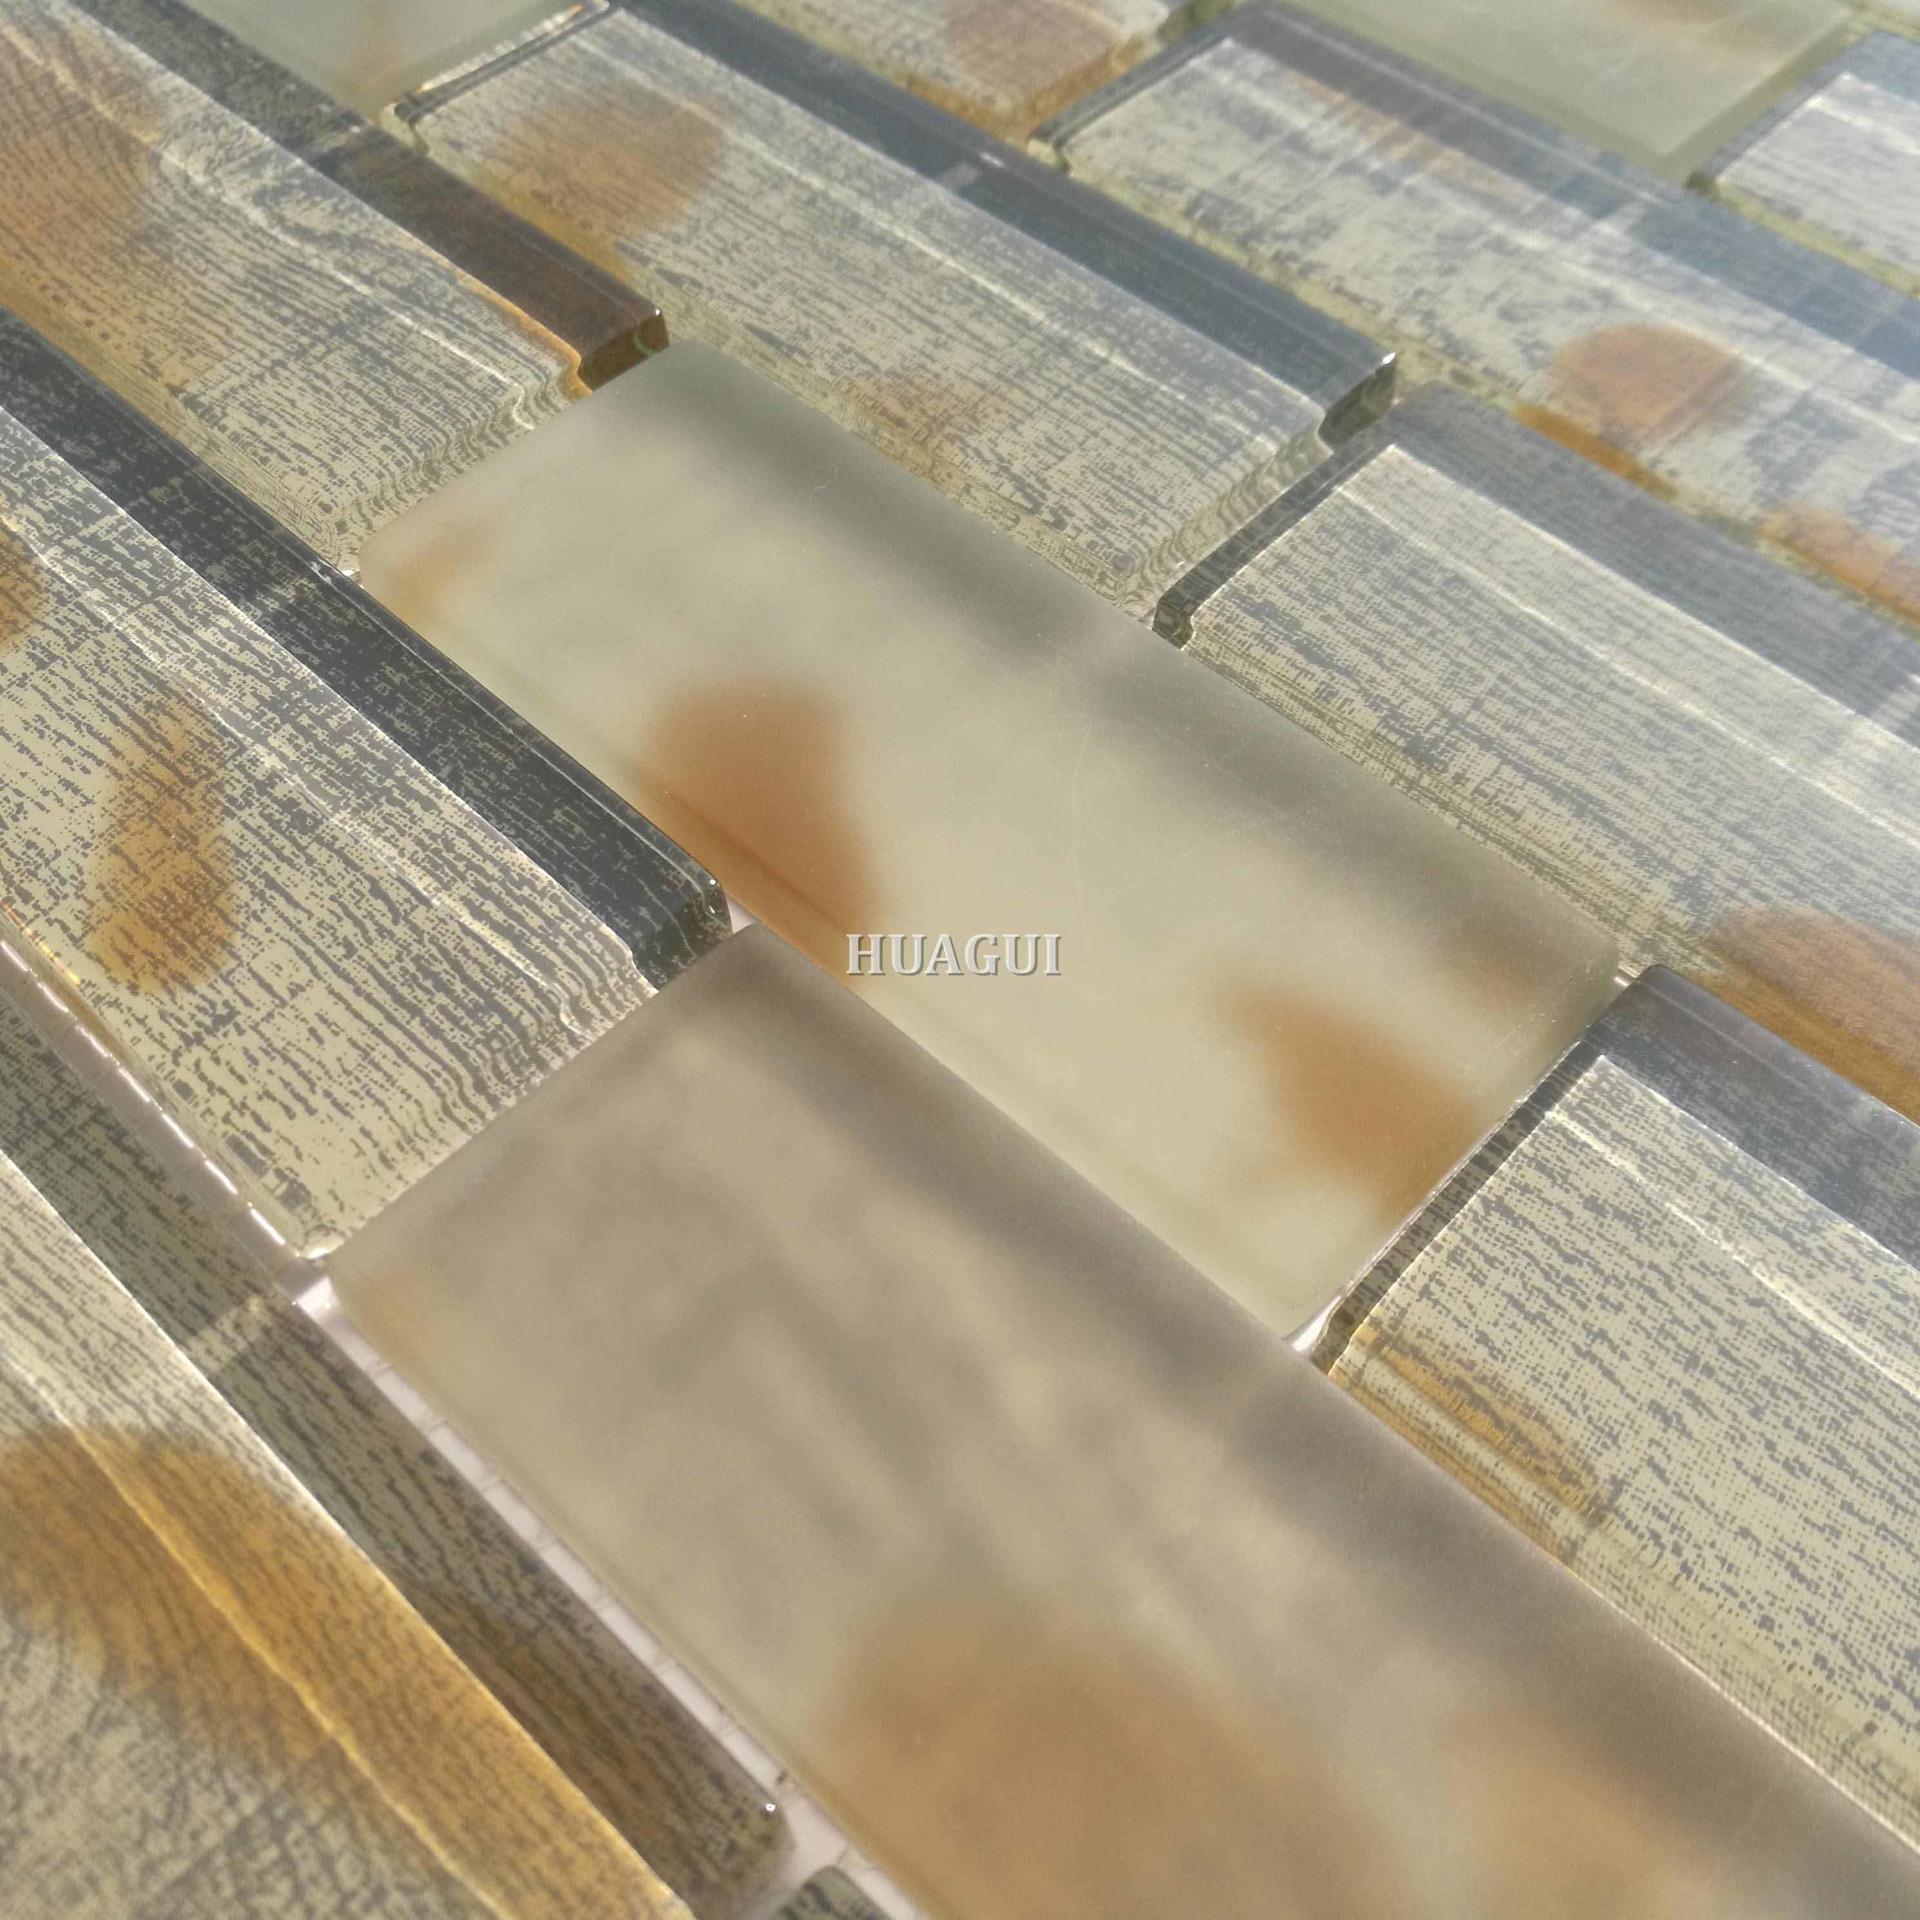 New design pattern 3x6 glass mosaic for the best kitchen backsplash tiles